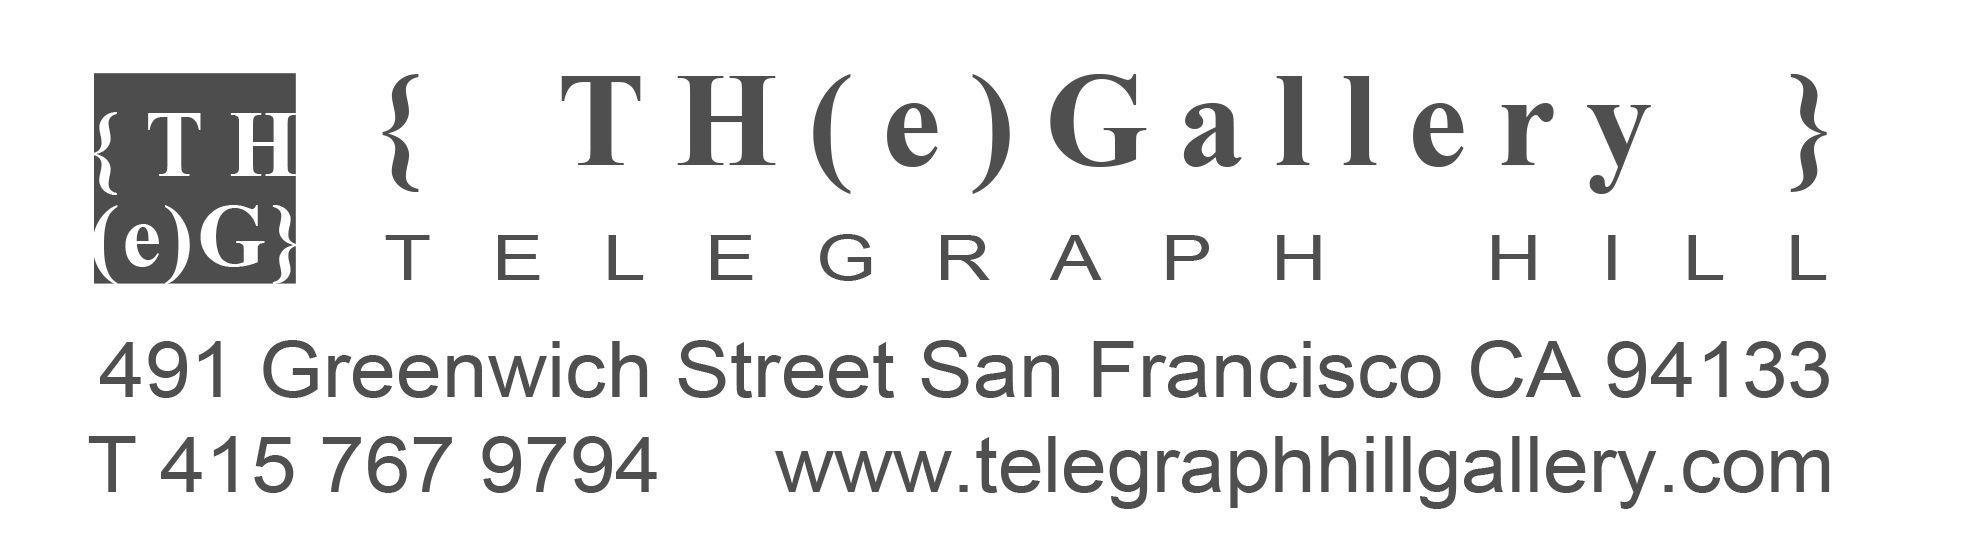 thegallery Logo